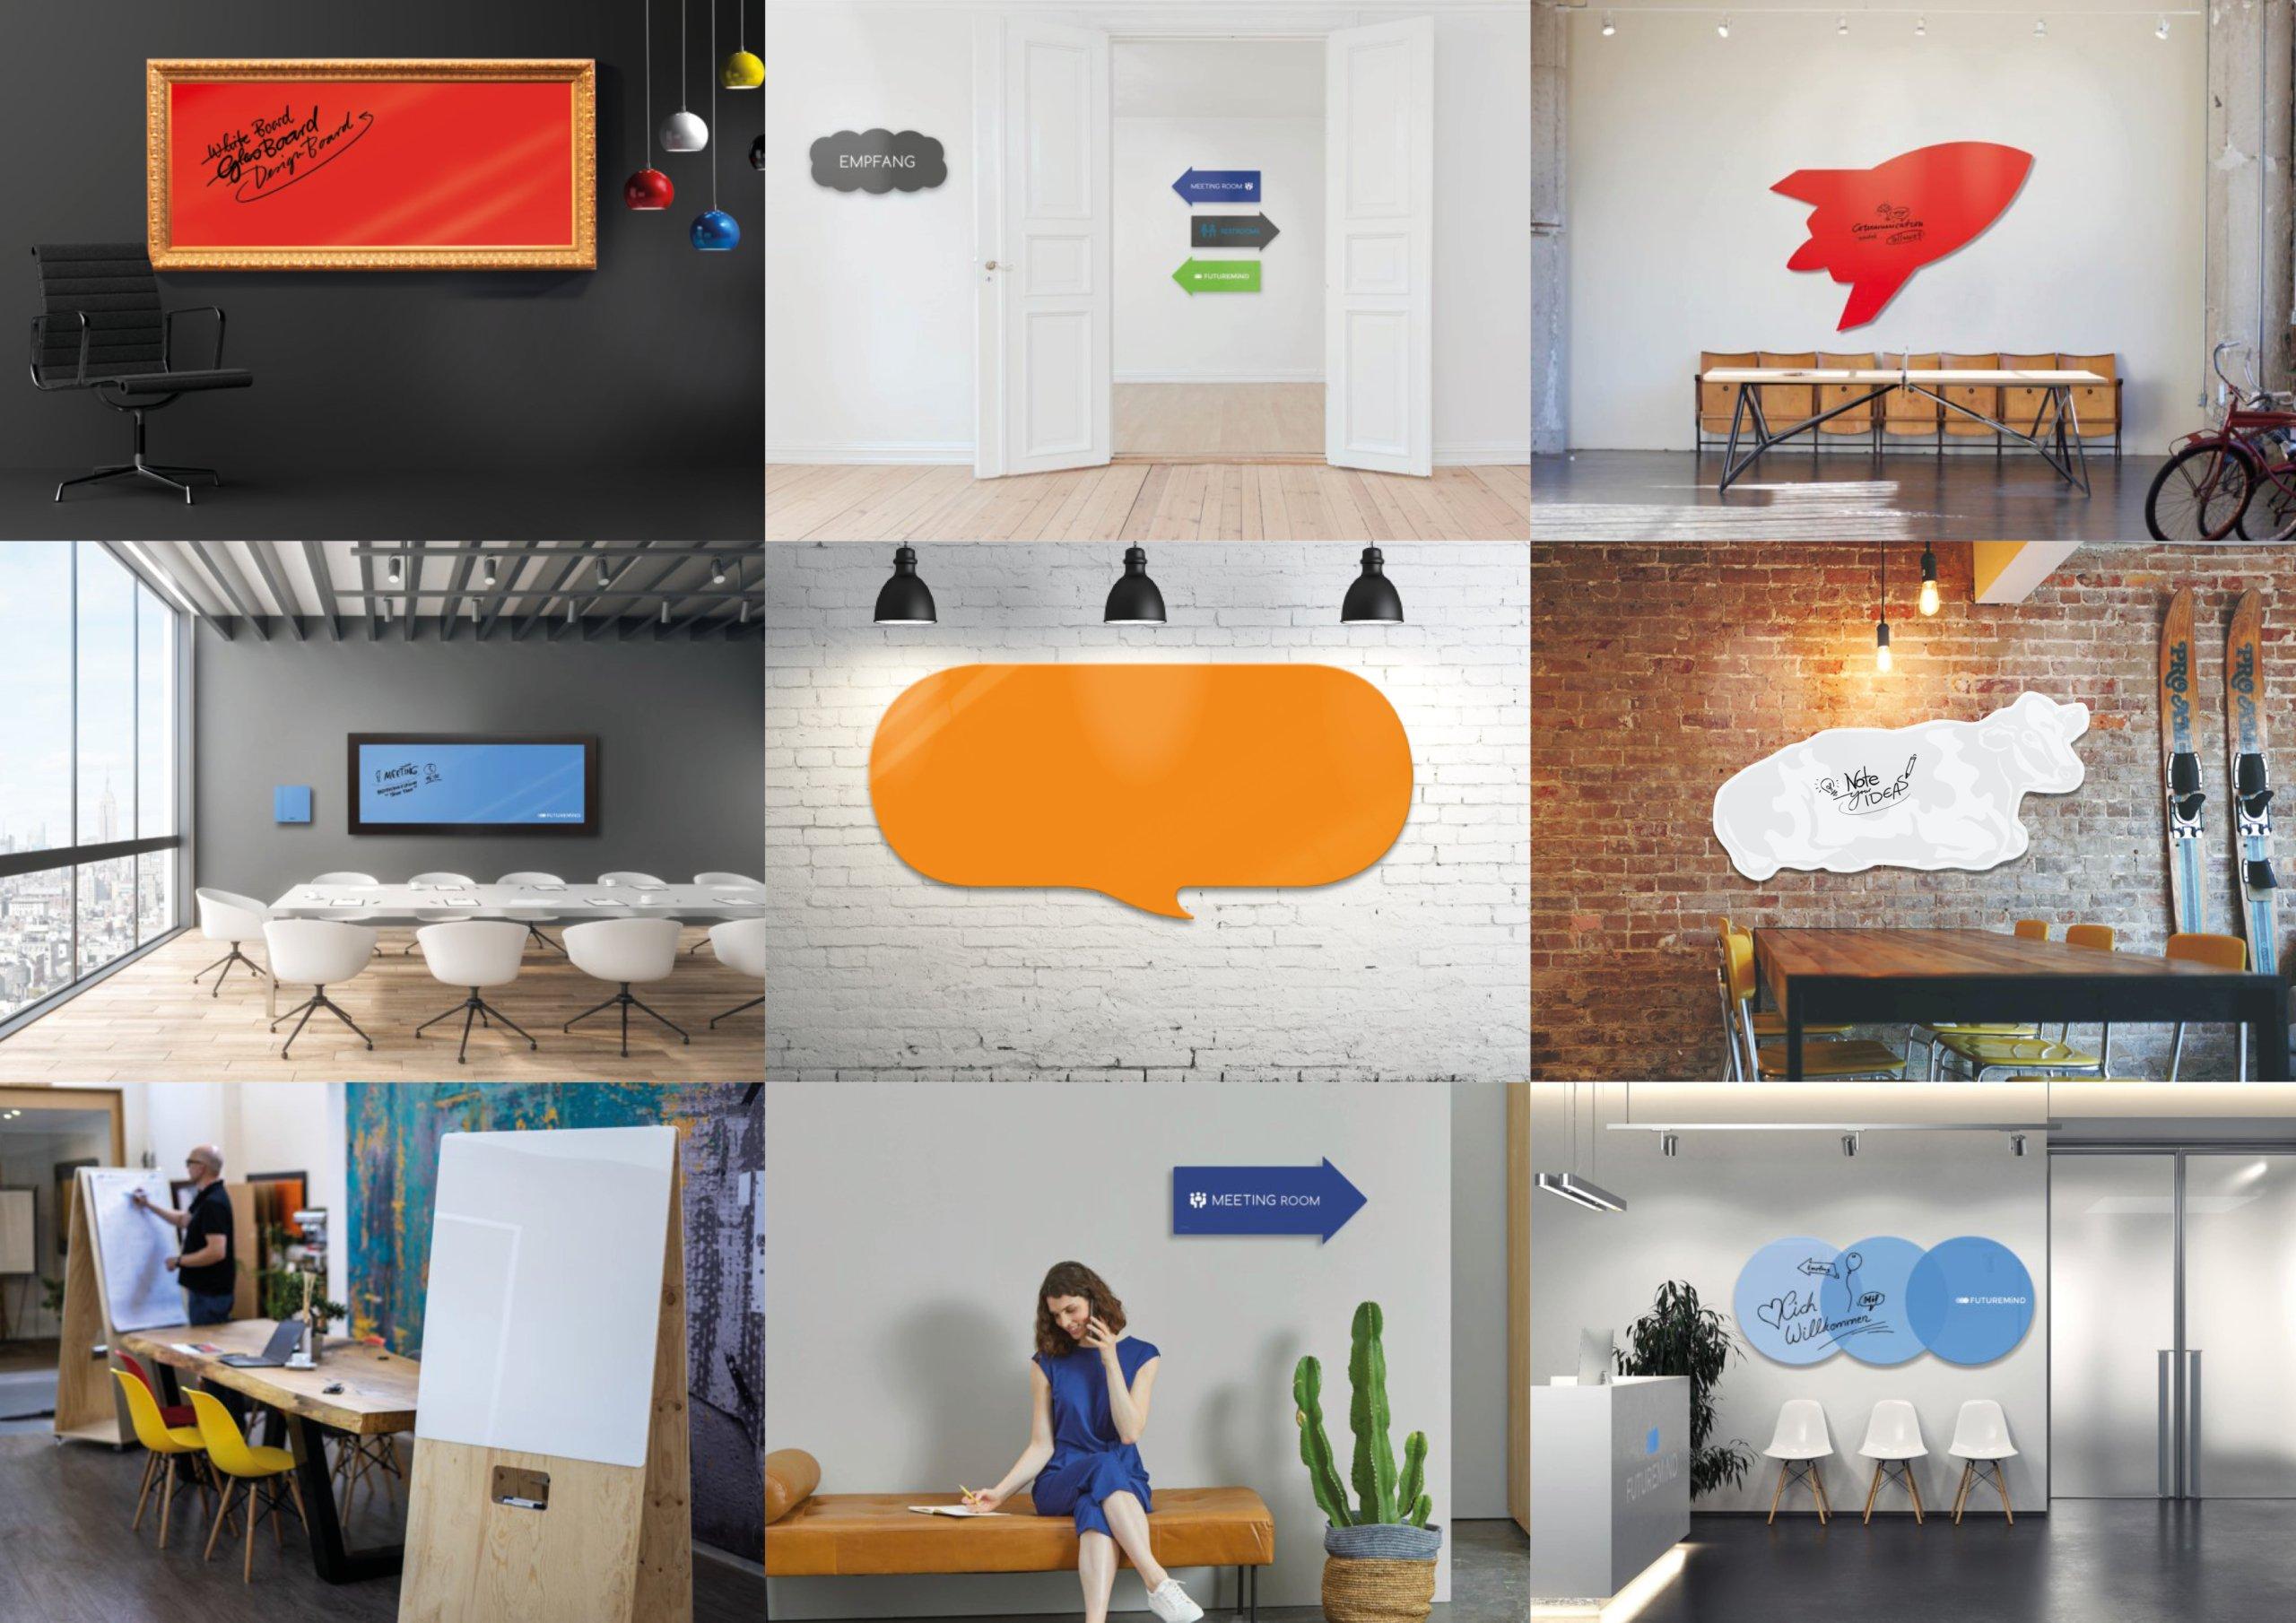 Individuelle WhiteBoards_Mobile Fliphcharts_Bürogestaltung nach Wunsch